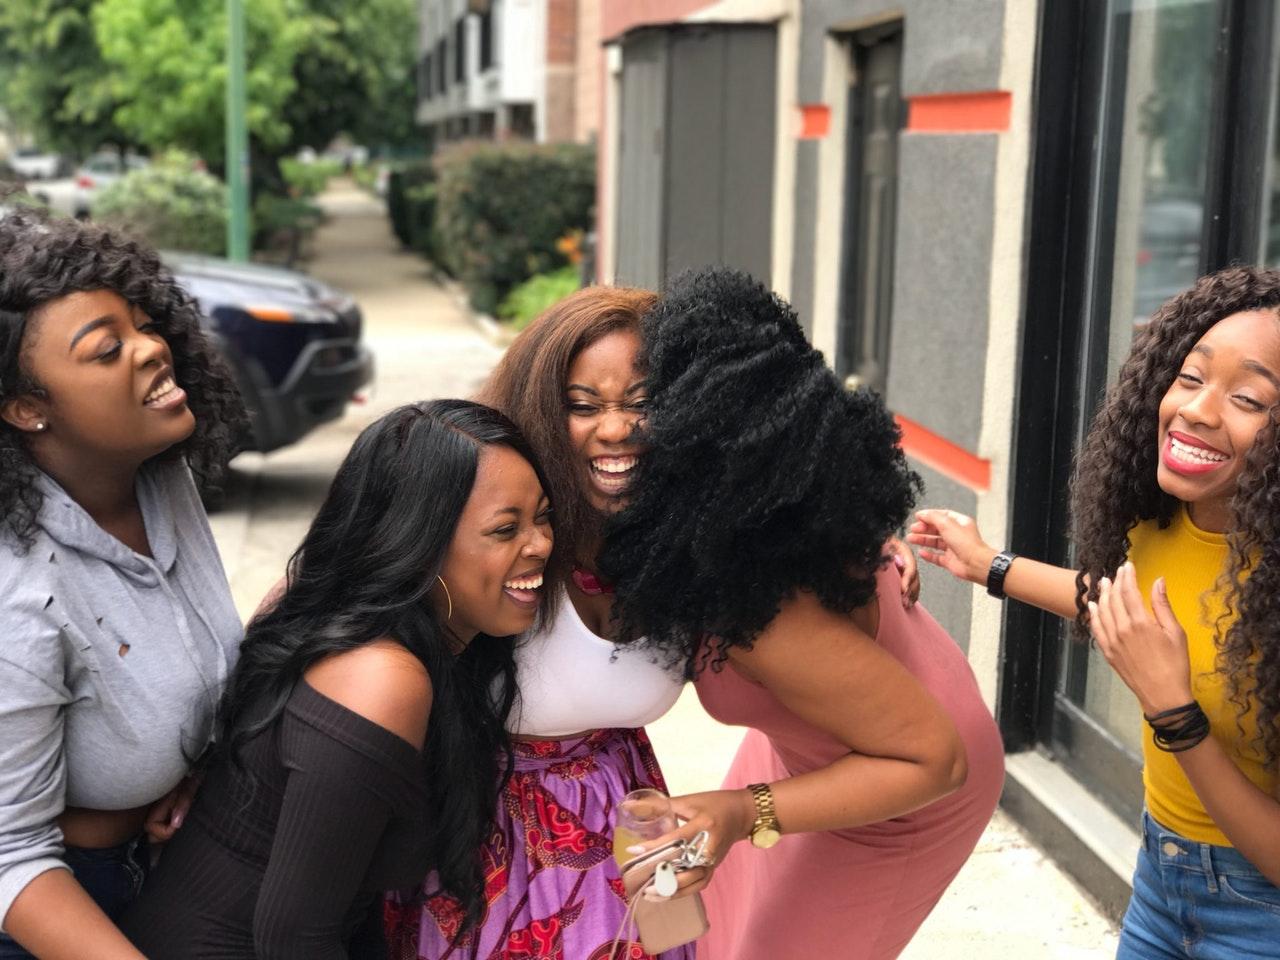 group of women having fun